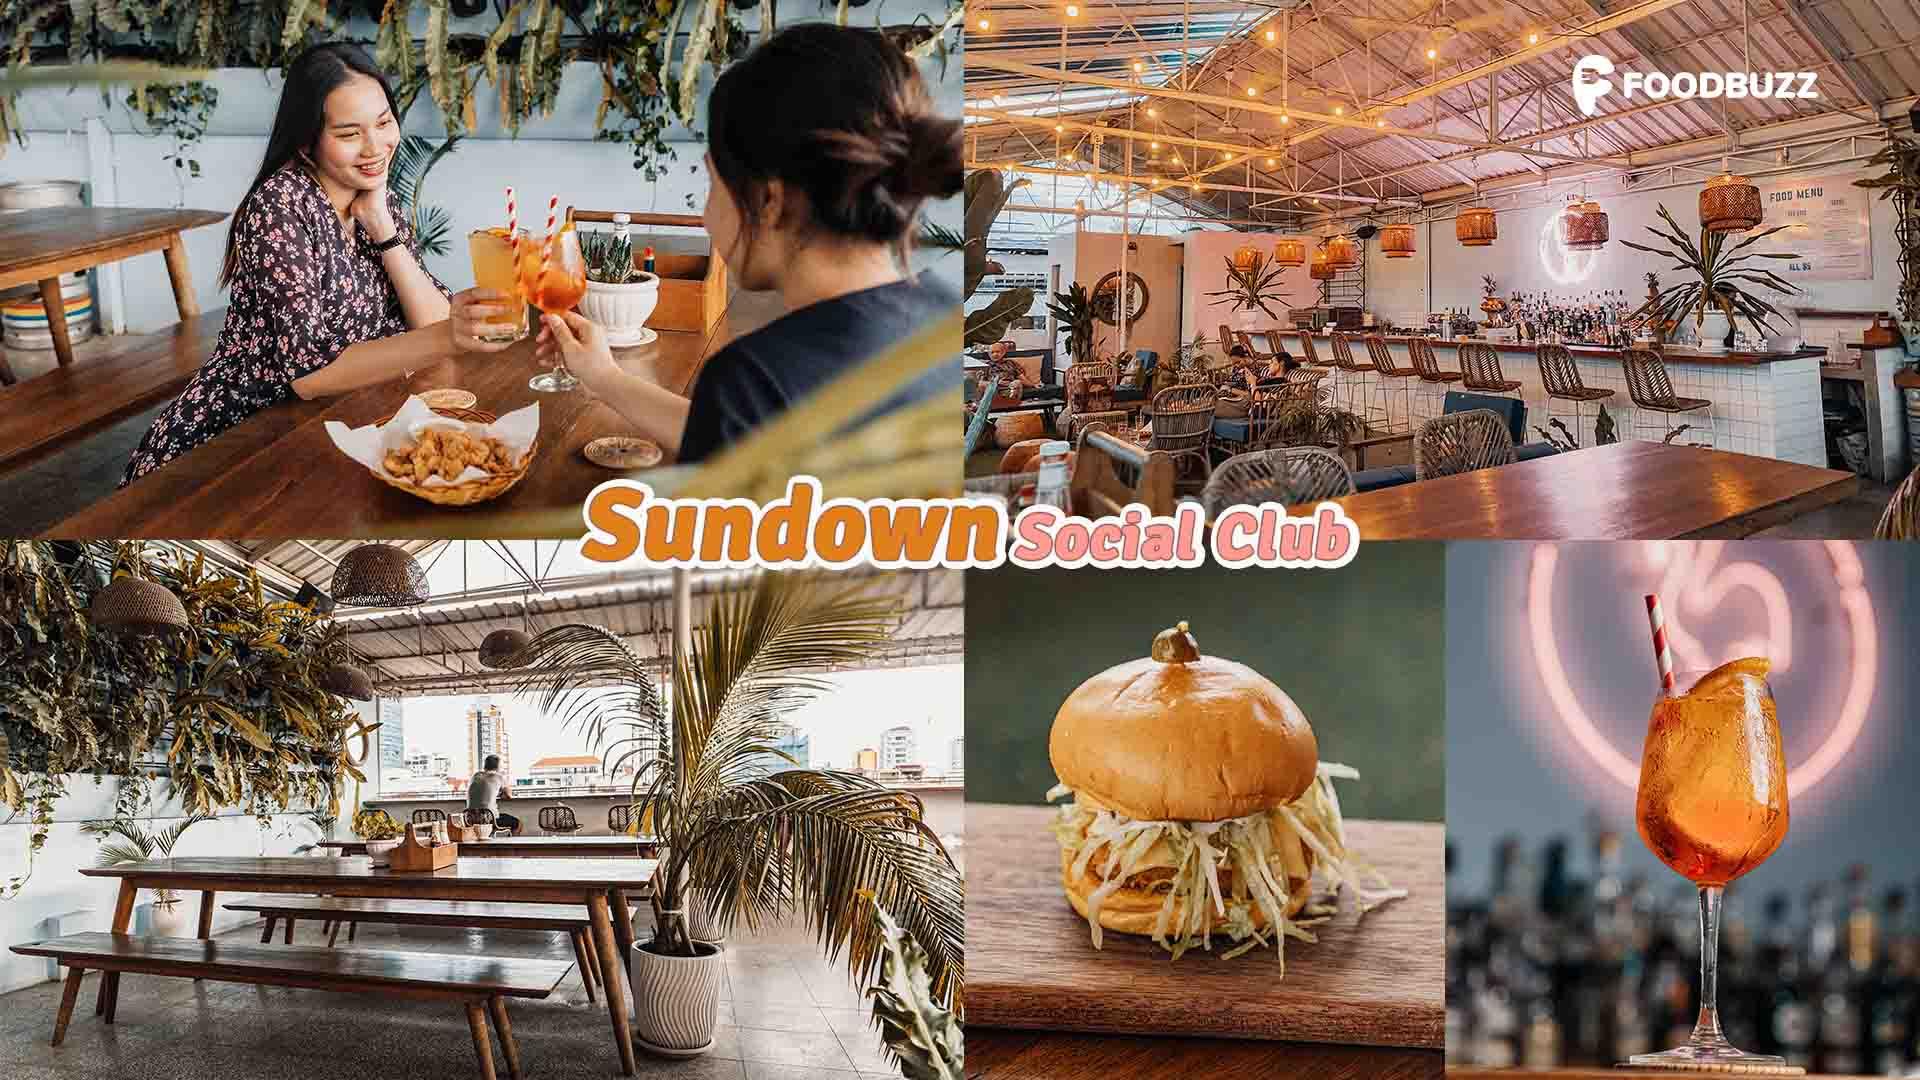 Sundown Social Club៖ បារនៅលើដំបូលជាន់ទី៣ កំពុងពេញនិយមខ្លាំងនៅម្ដុំទួលទំពូង